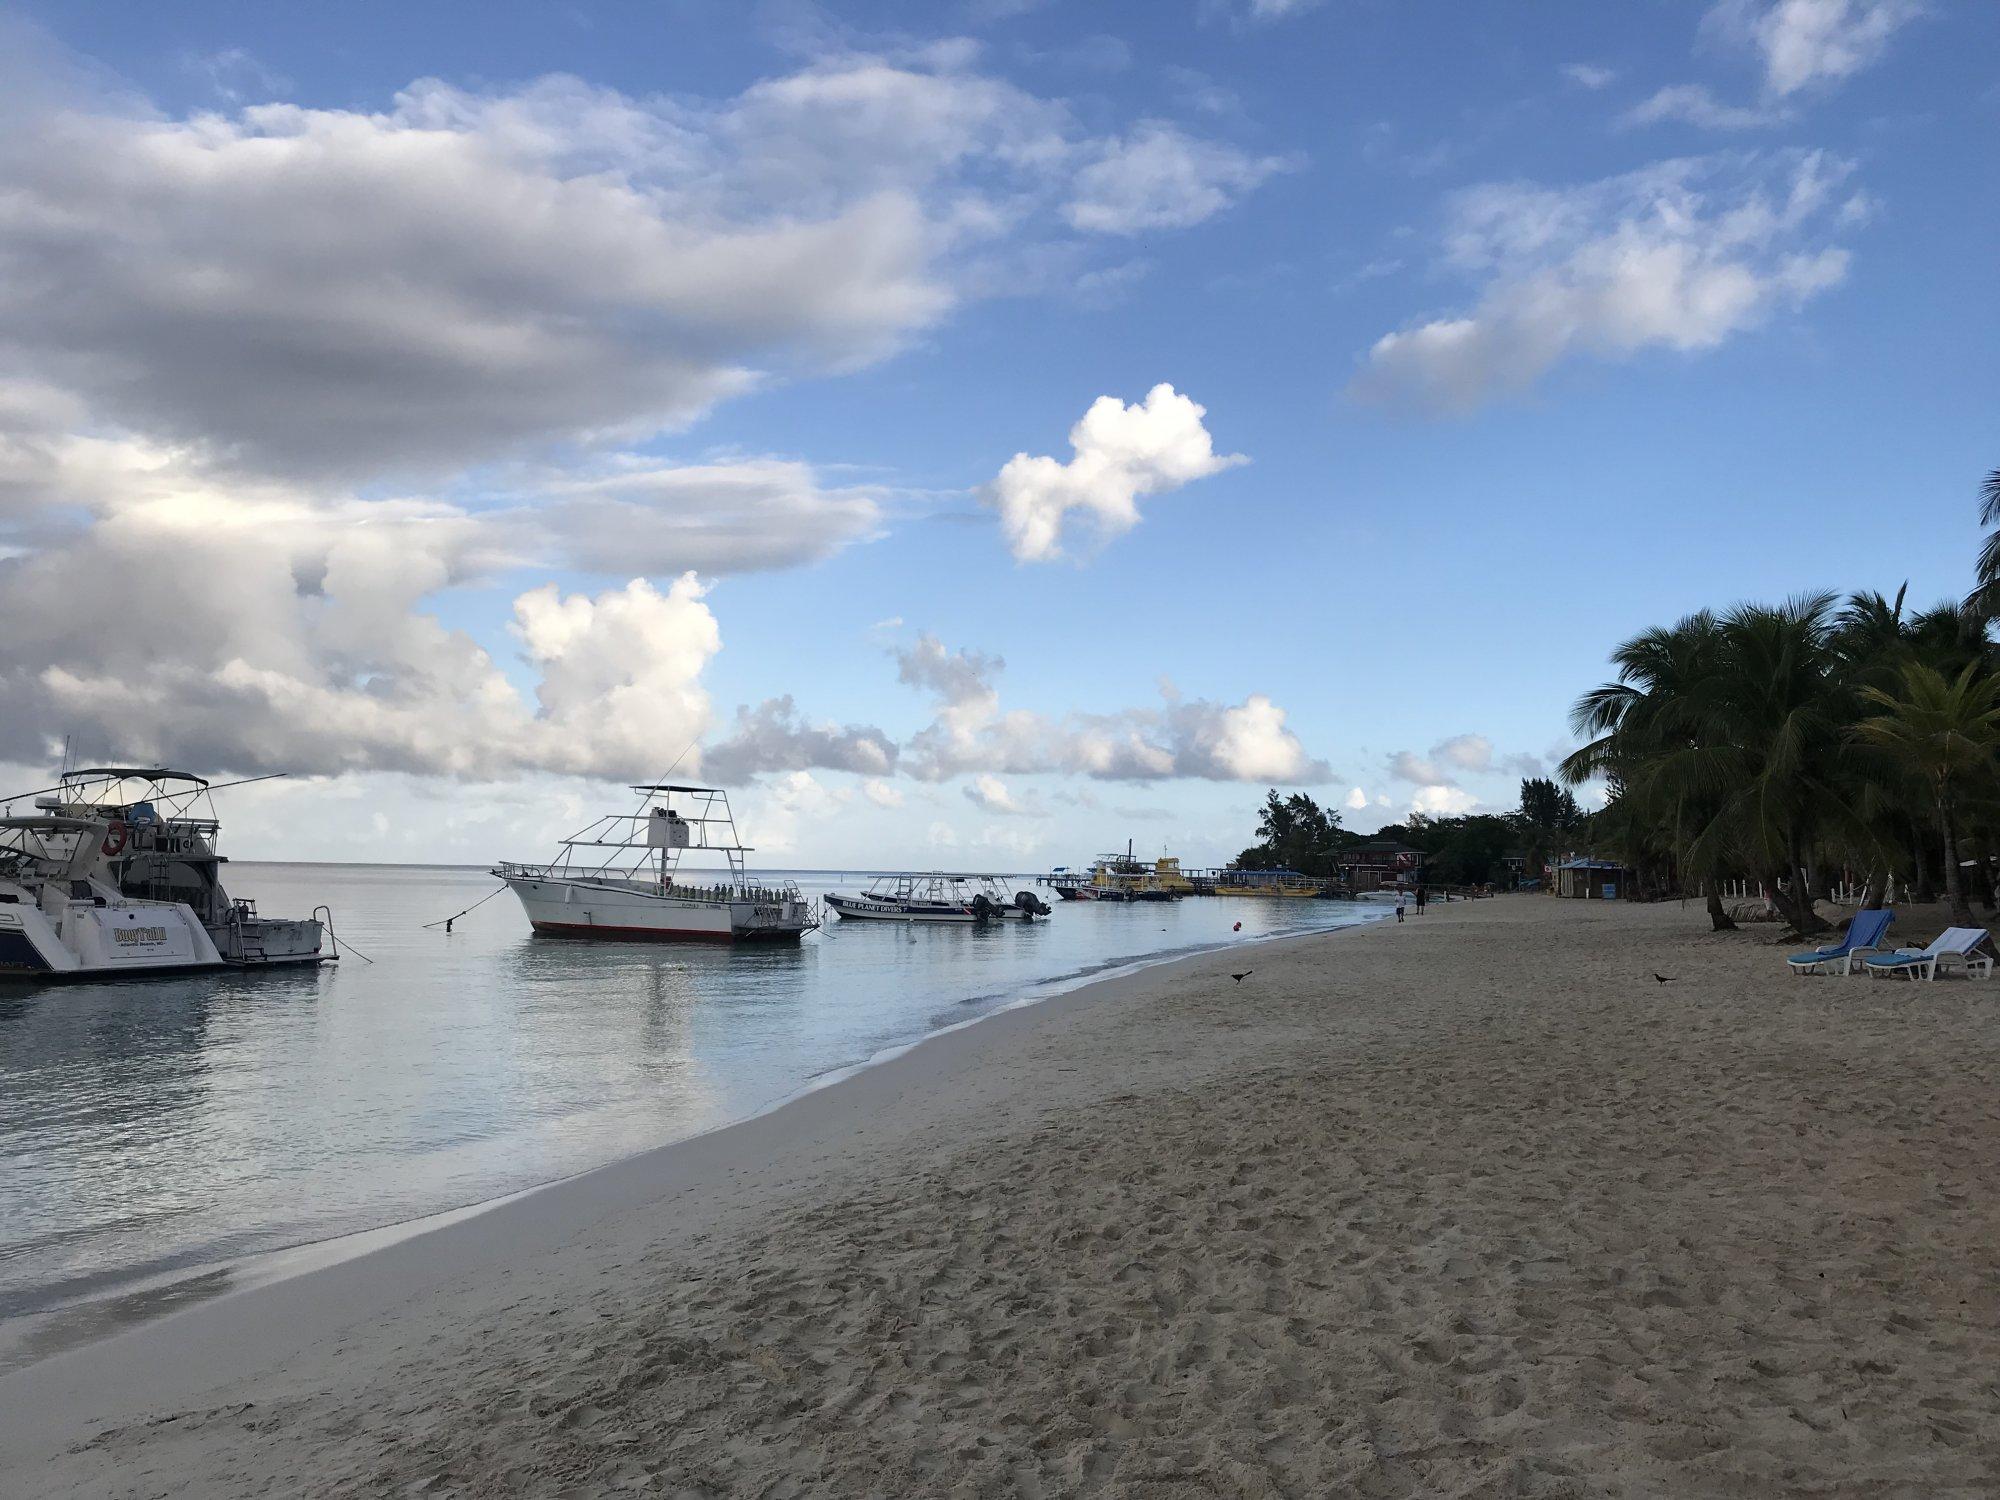 Plage de West Bay, Roatan, Honduras